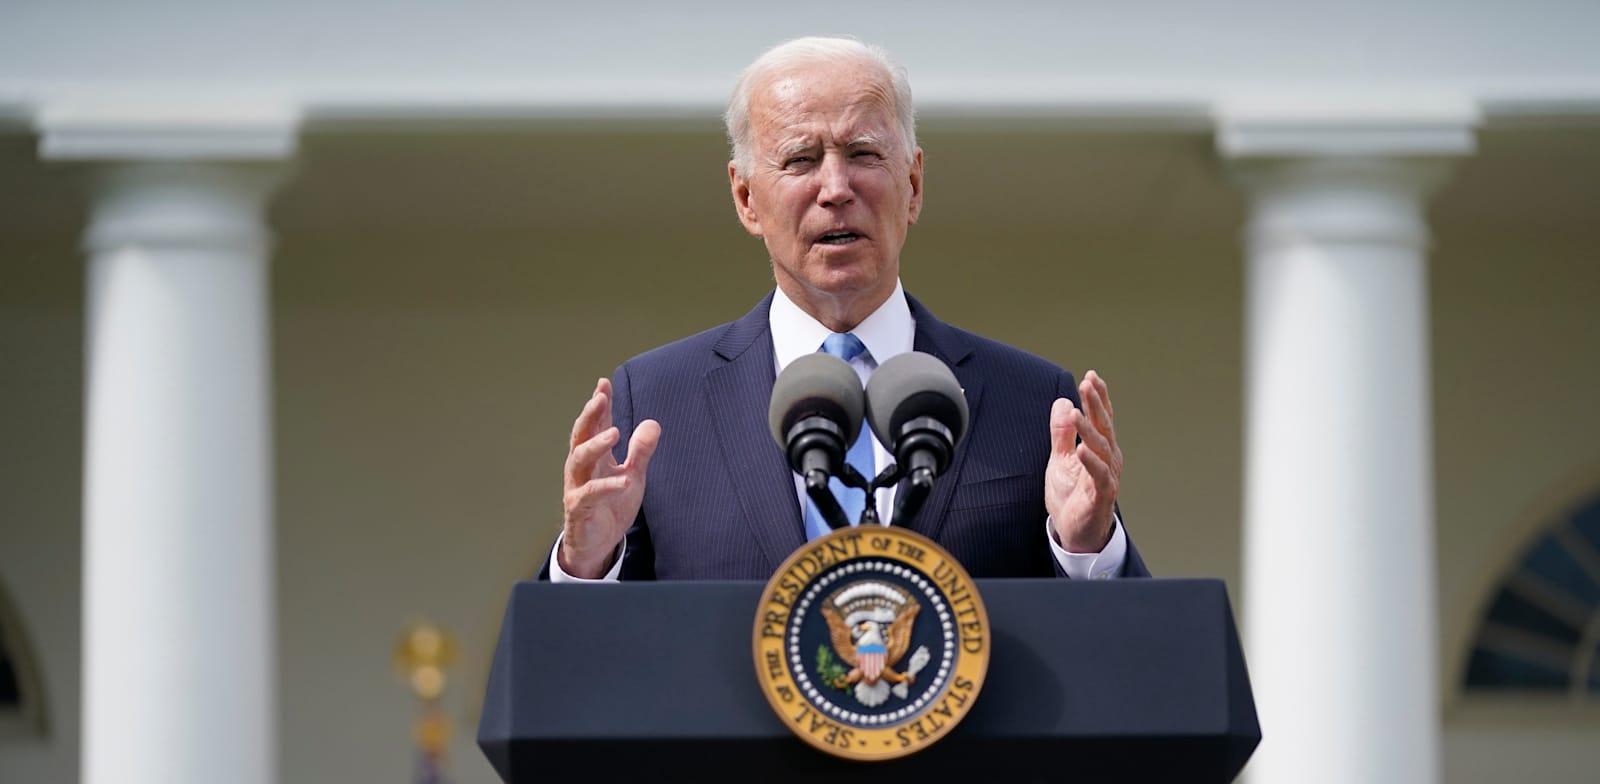 הנשיא ביידן. מגביר את אי־השוויון? / צילום: Associated Press, Evan Vucci